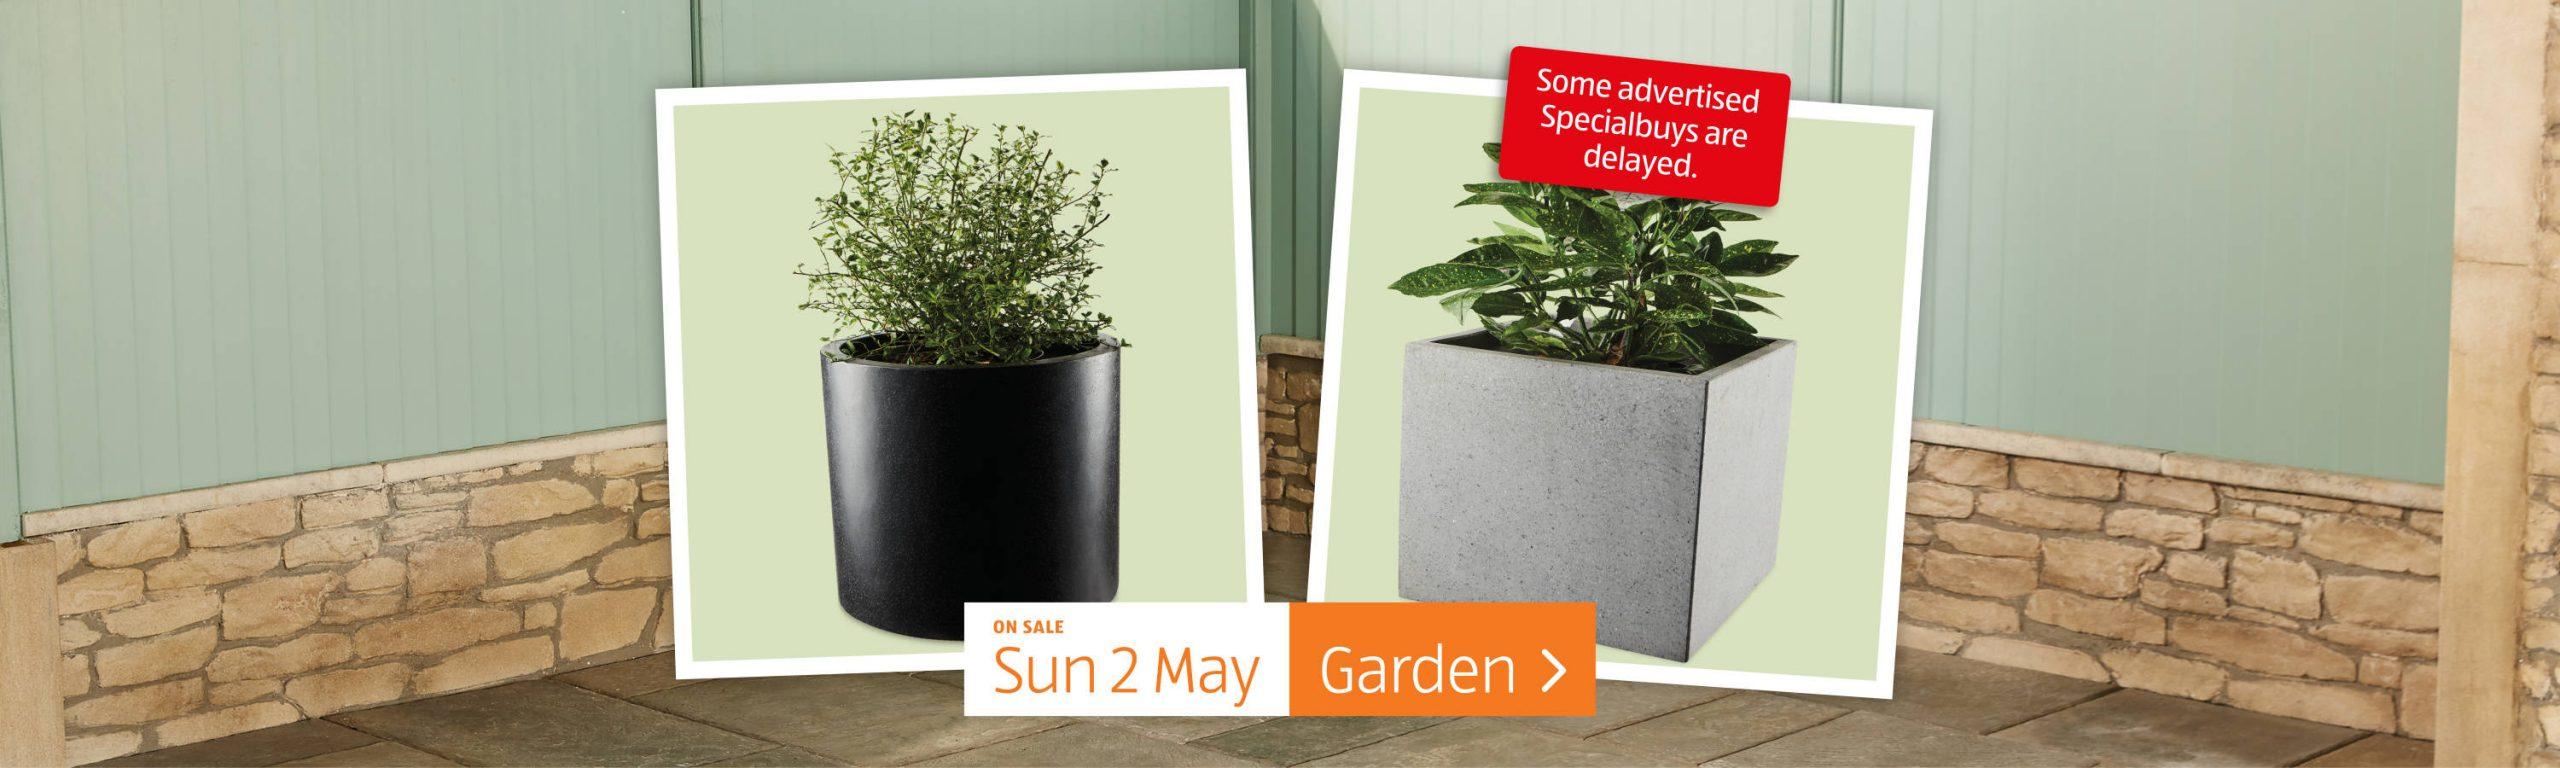 ALDI Sunday Offers Garden 2nd May 2021